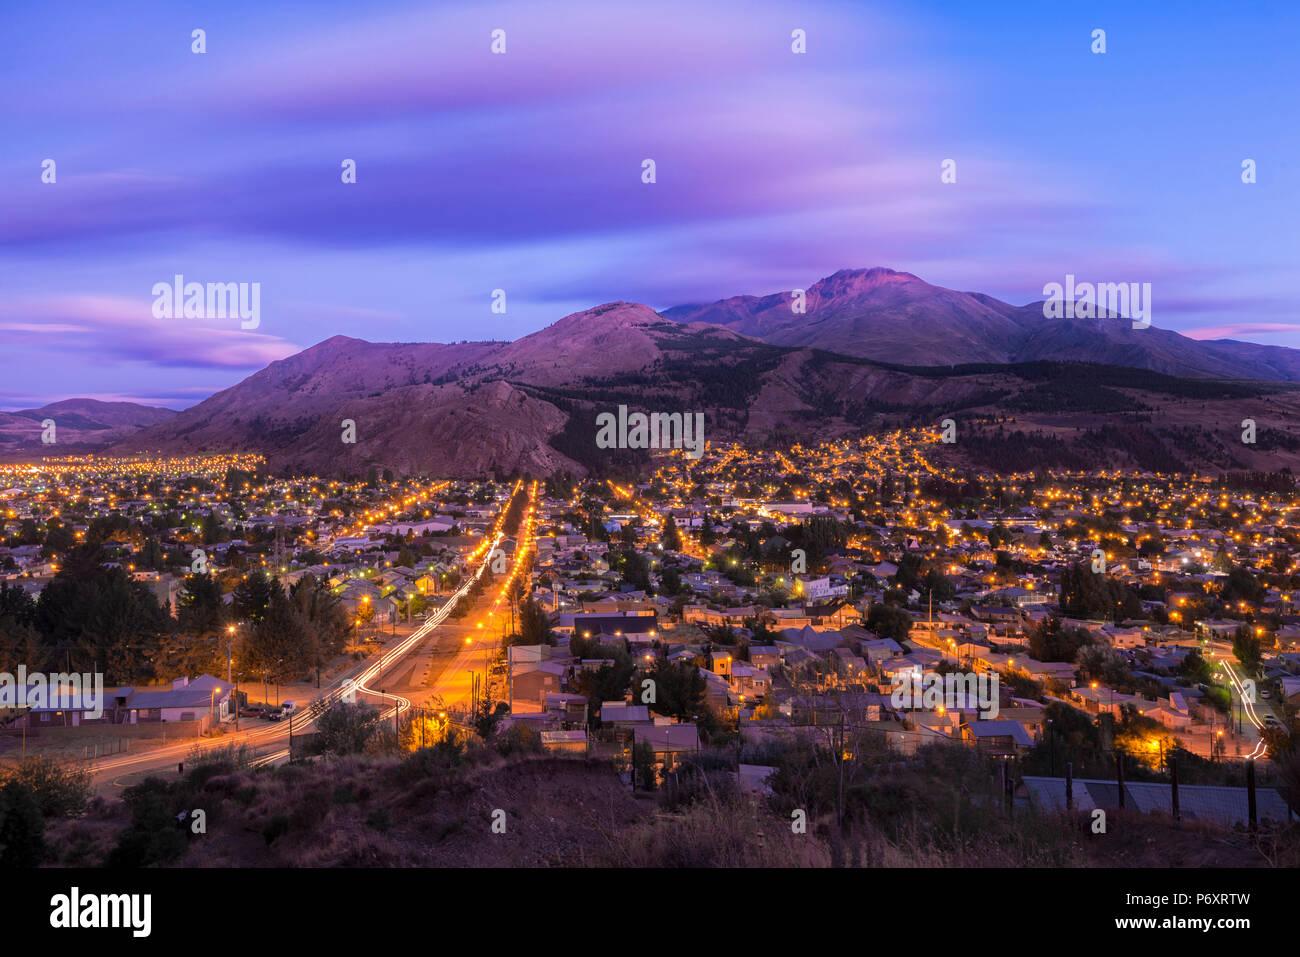 Sud America, Argentina, Patagonia, Rio Negro, Esquel di notte Immagini Stock